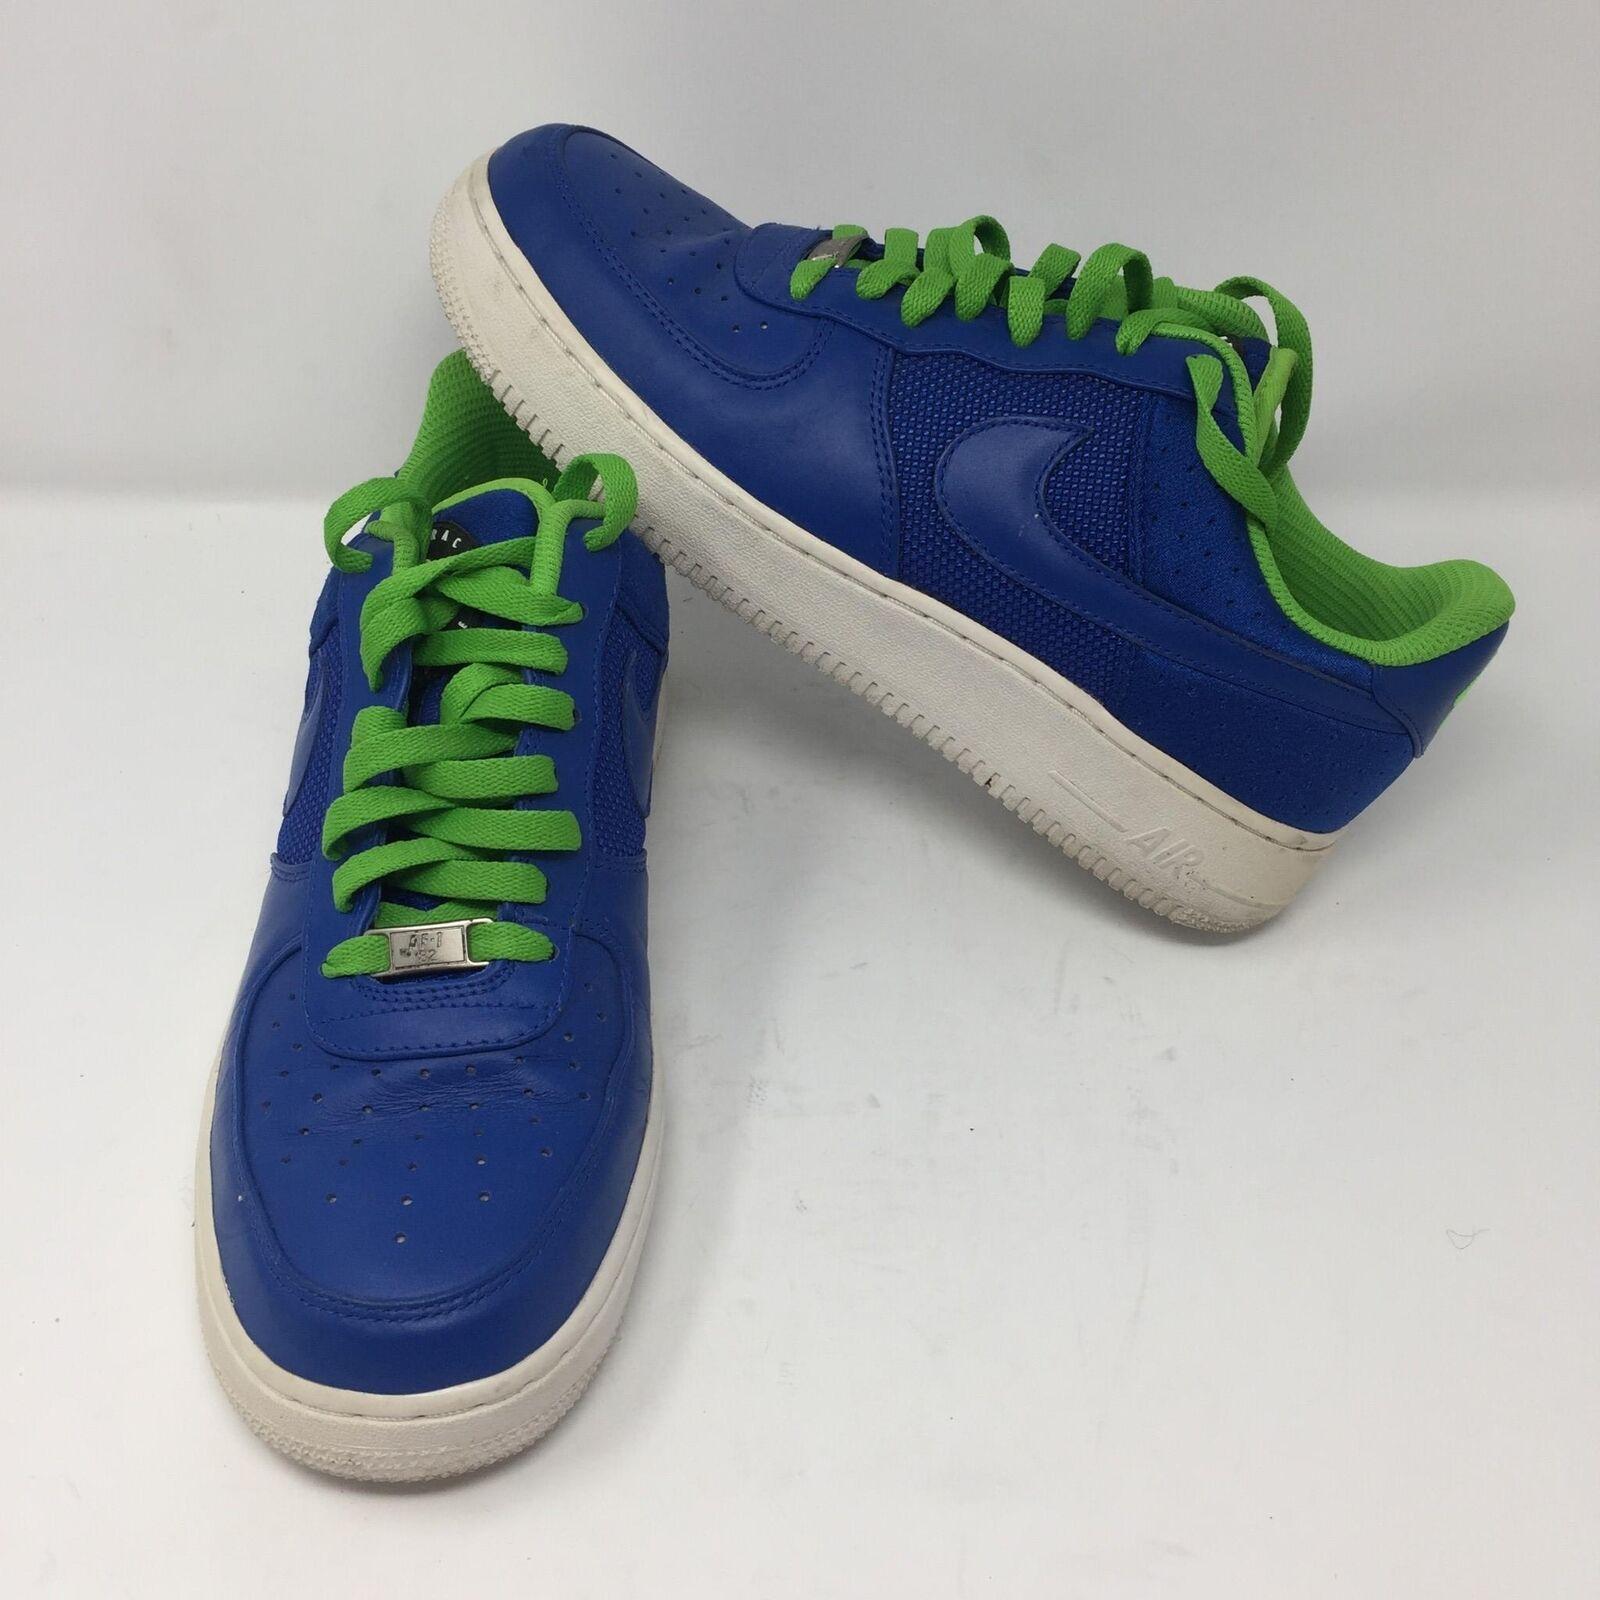 brand new cc7f3 5ca7b Nike Nike Nike Air Force 1 Canvas bluee Neon Green Mens shoes Sz 9 354716-